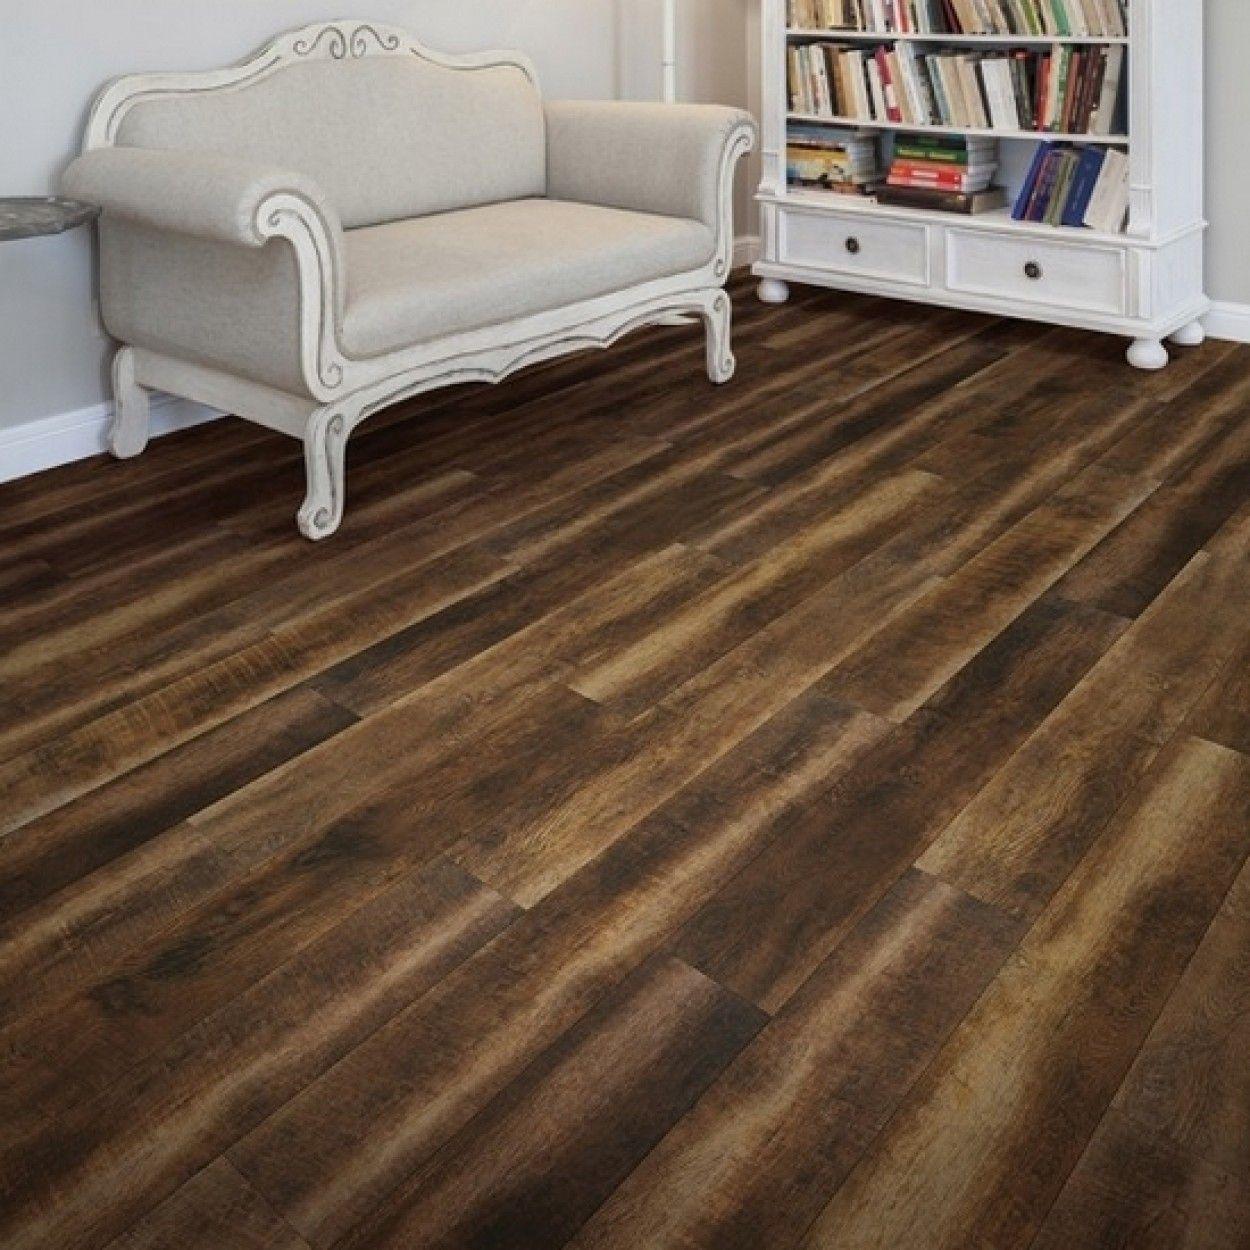 Coretec Hd 50lvr651 Vineyard Barrel Driftwood Deco Baroque Plancher Parquet En Chene